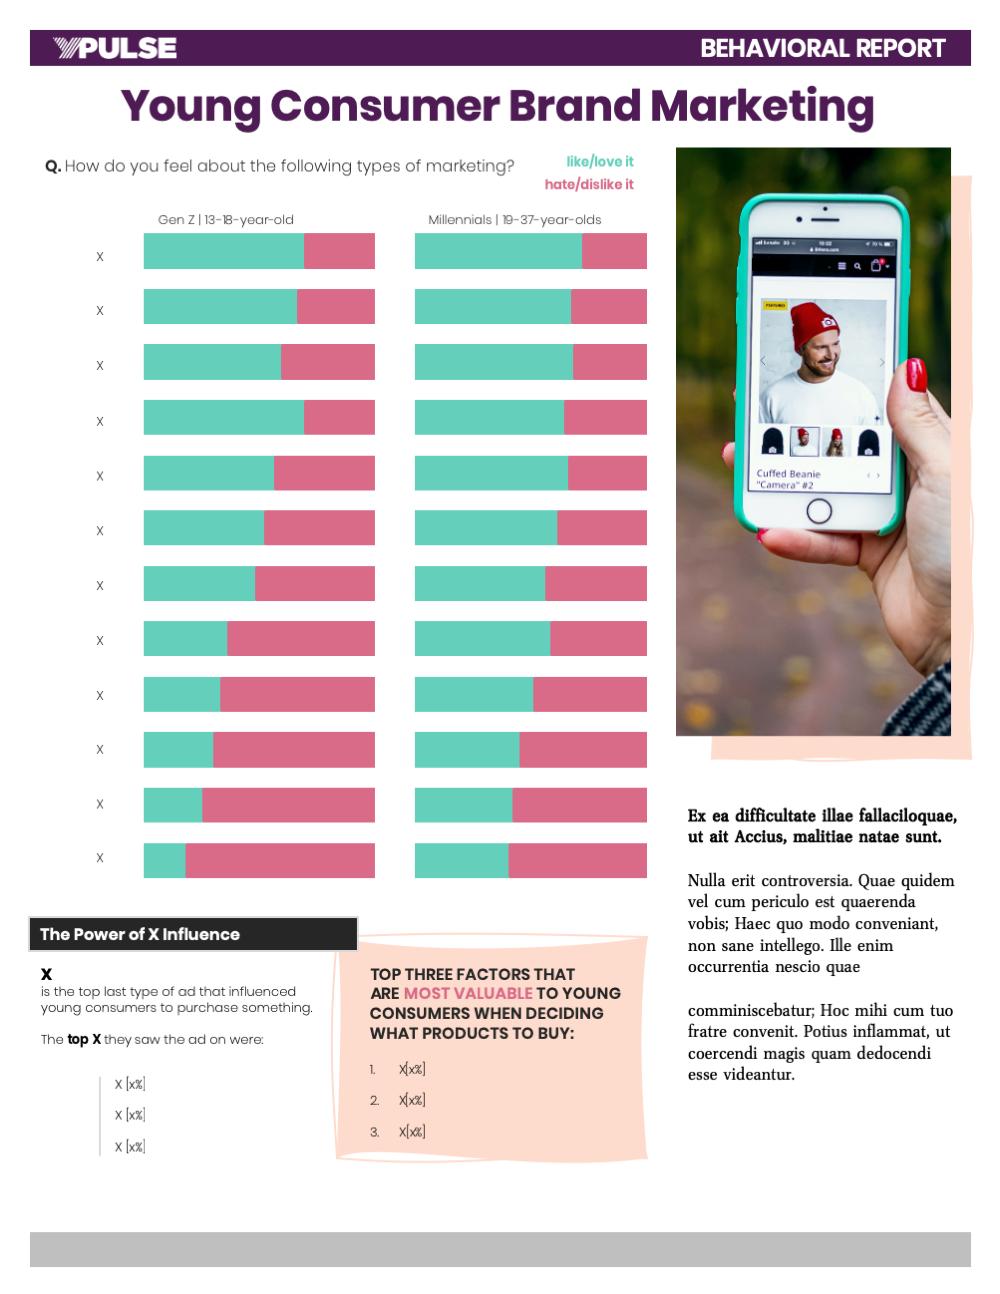 Ad & Marketing Effectiveness